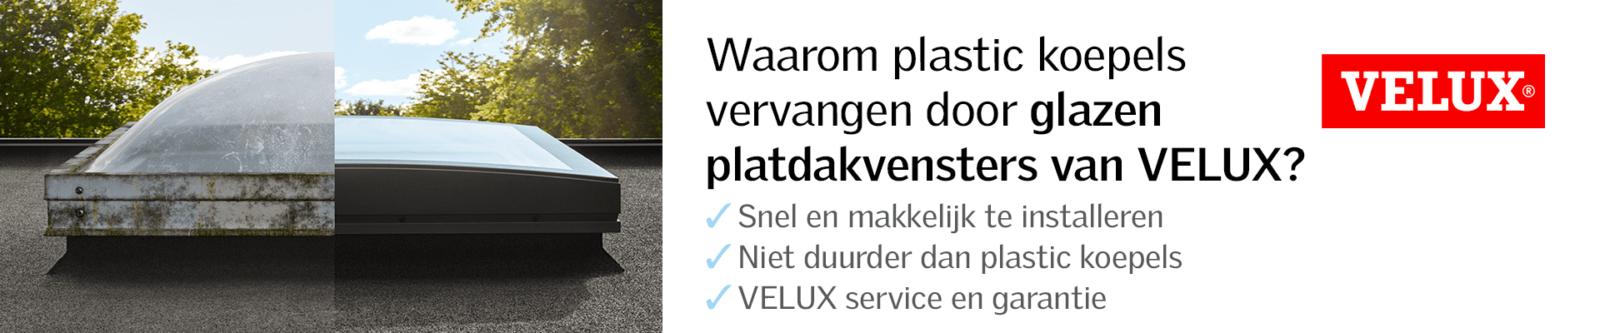 VELUX-BE-P-3263_banner-1920x400-nl-03